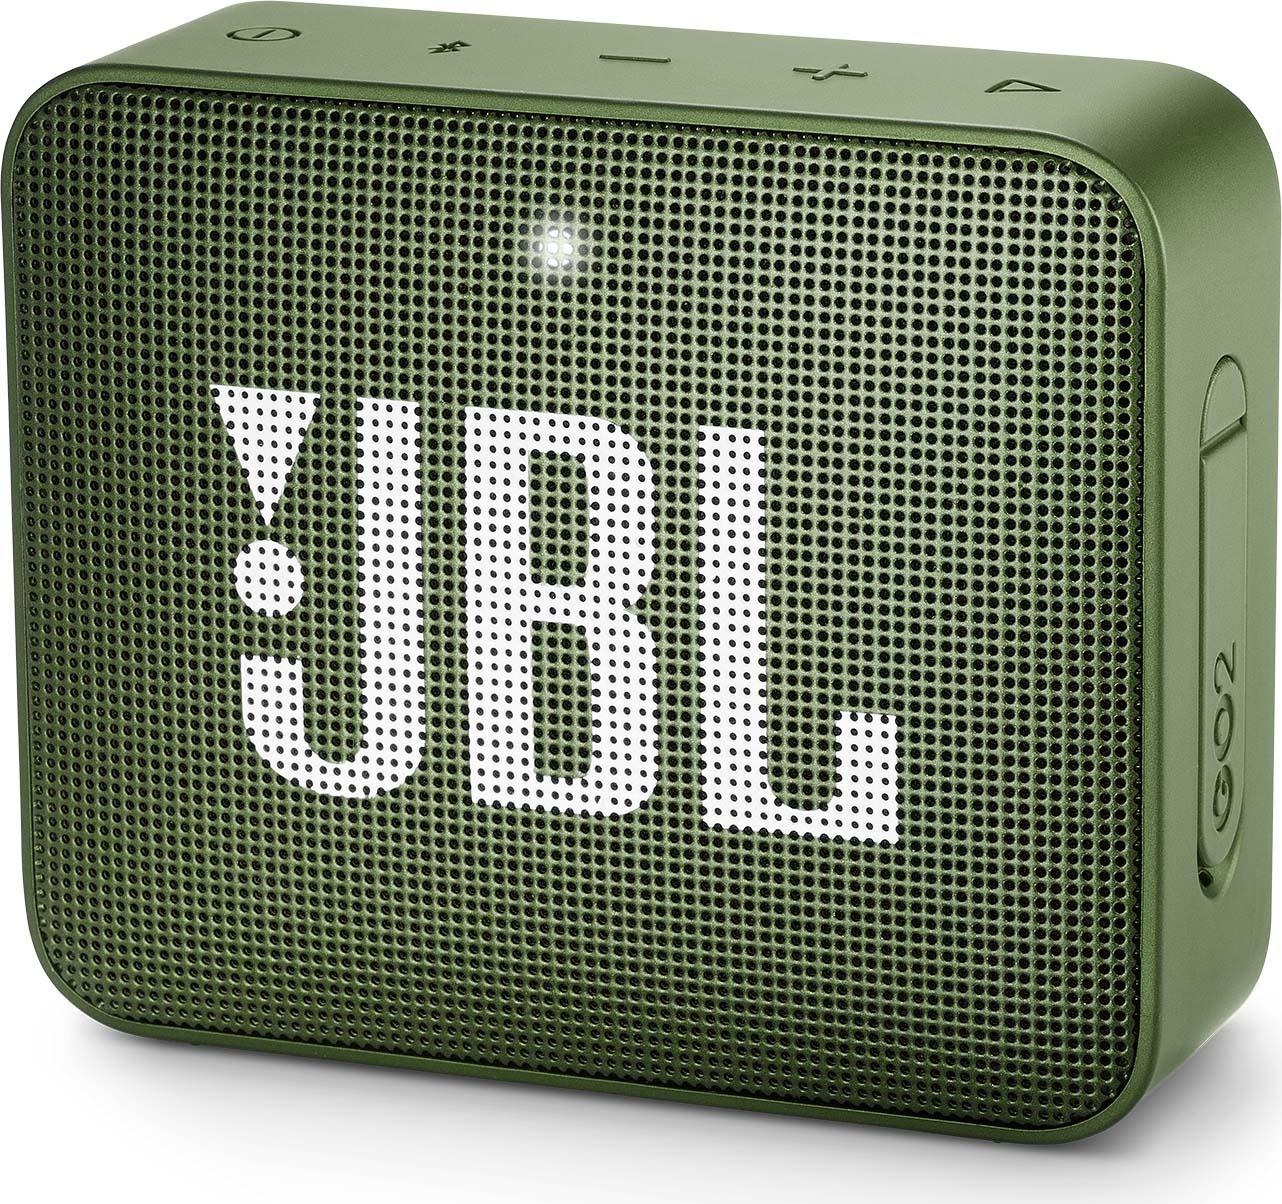 Беспроводная колонка JBL Go 2, Green беспроводная колонка jbl go 2 green